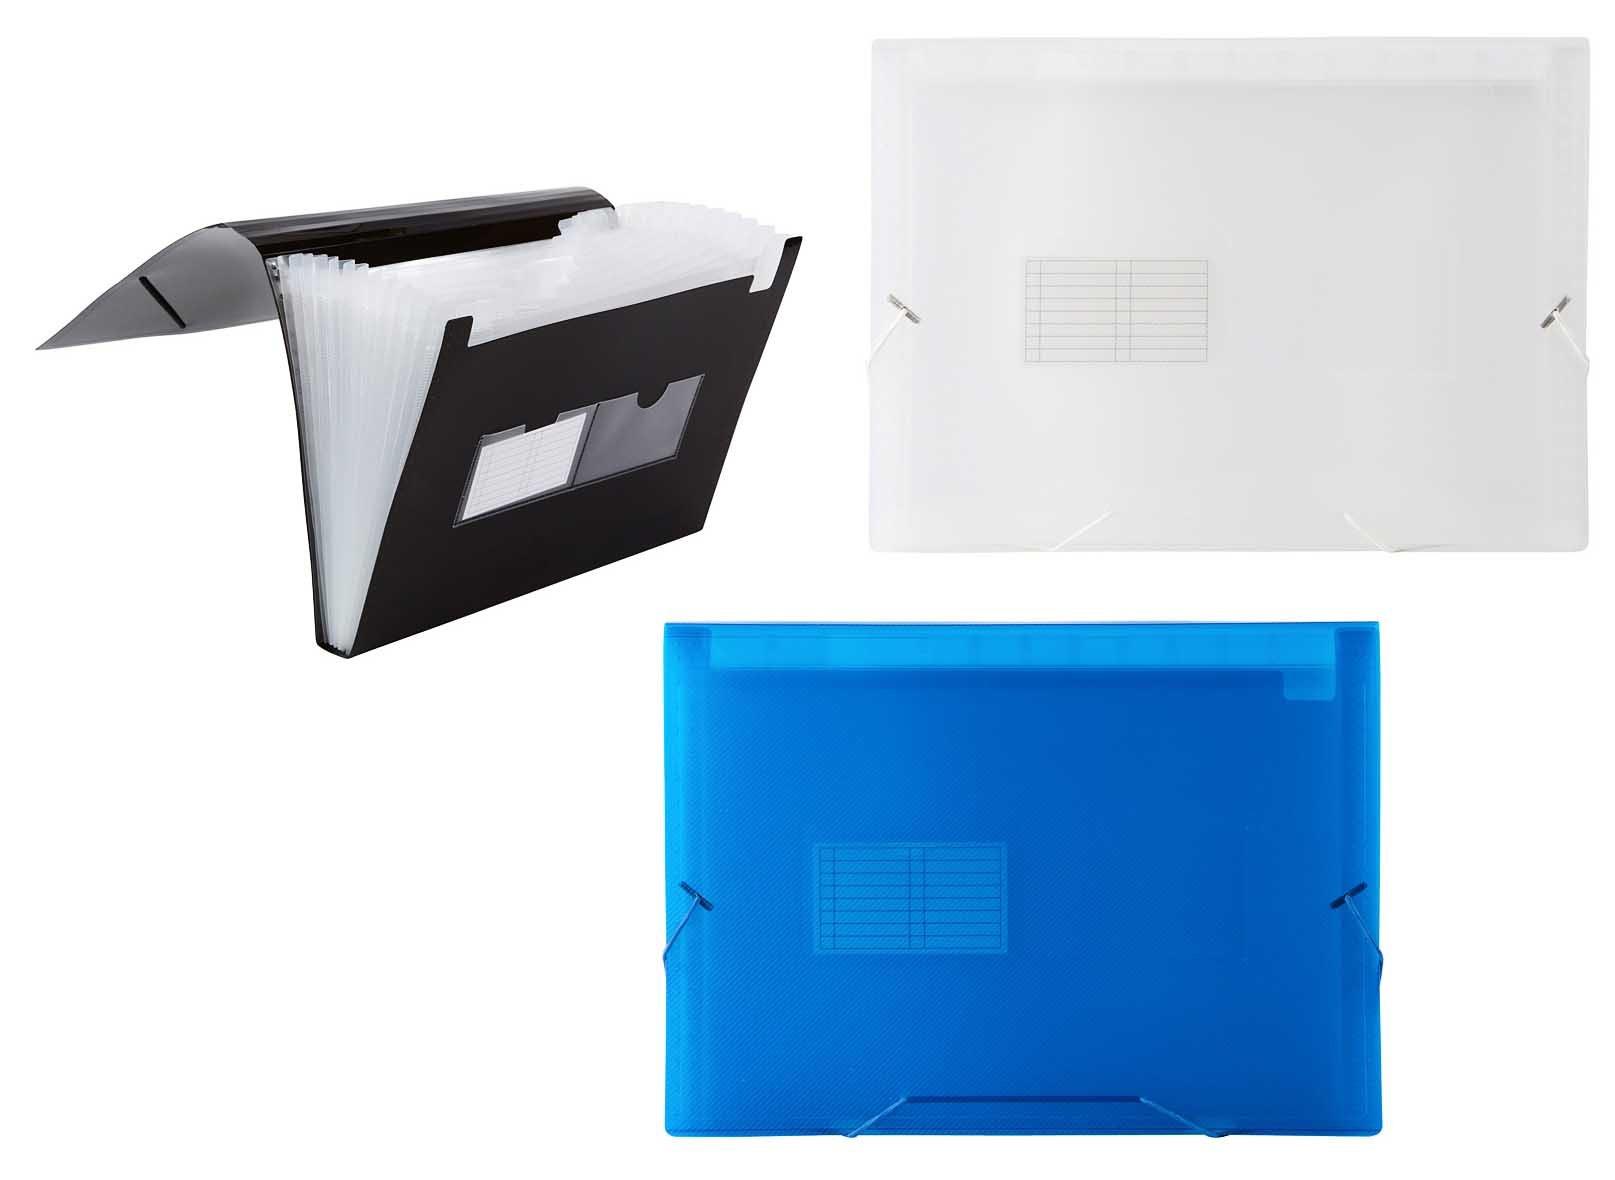 Filexec 50013-4322 Expanding File, Translucent, 13 Pockets, Letter Size, Set of 3, 3 Assorted Colors Black, Blue, Clear